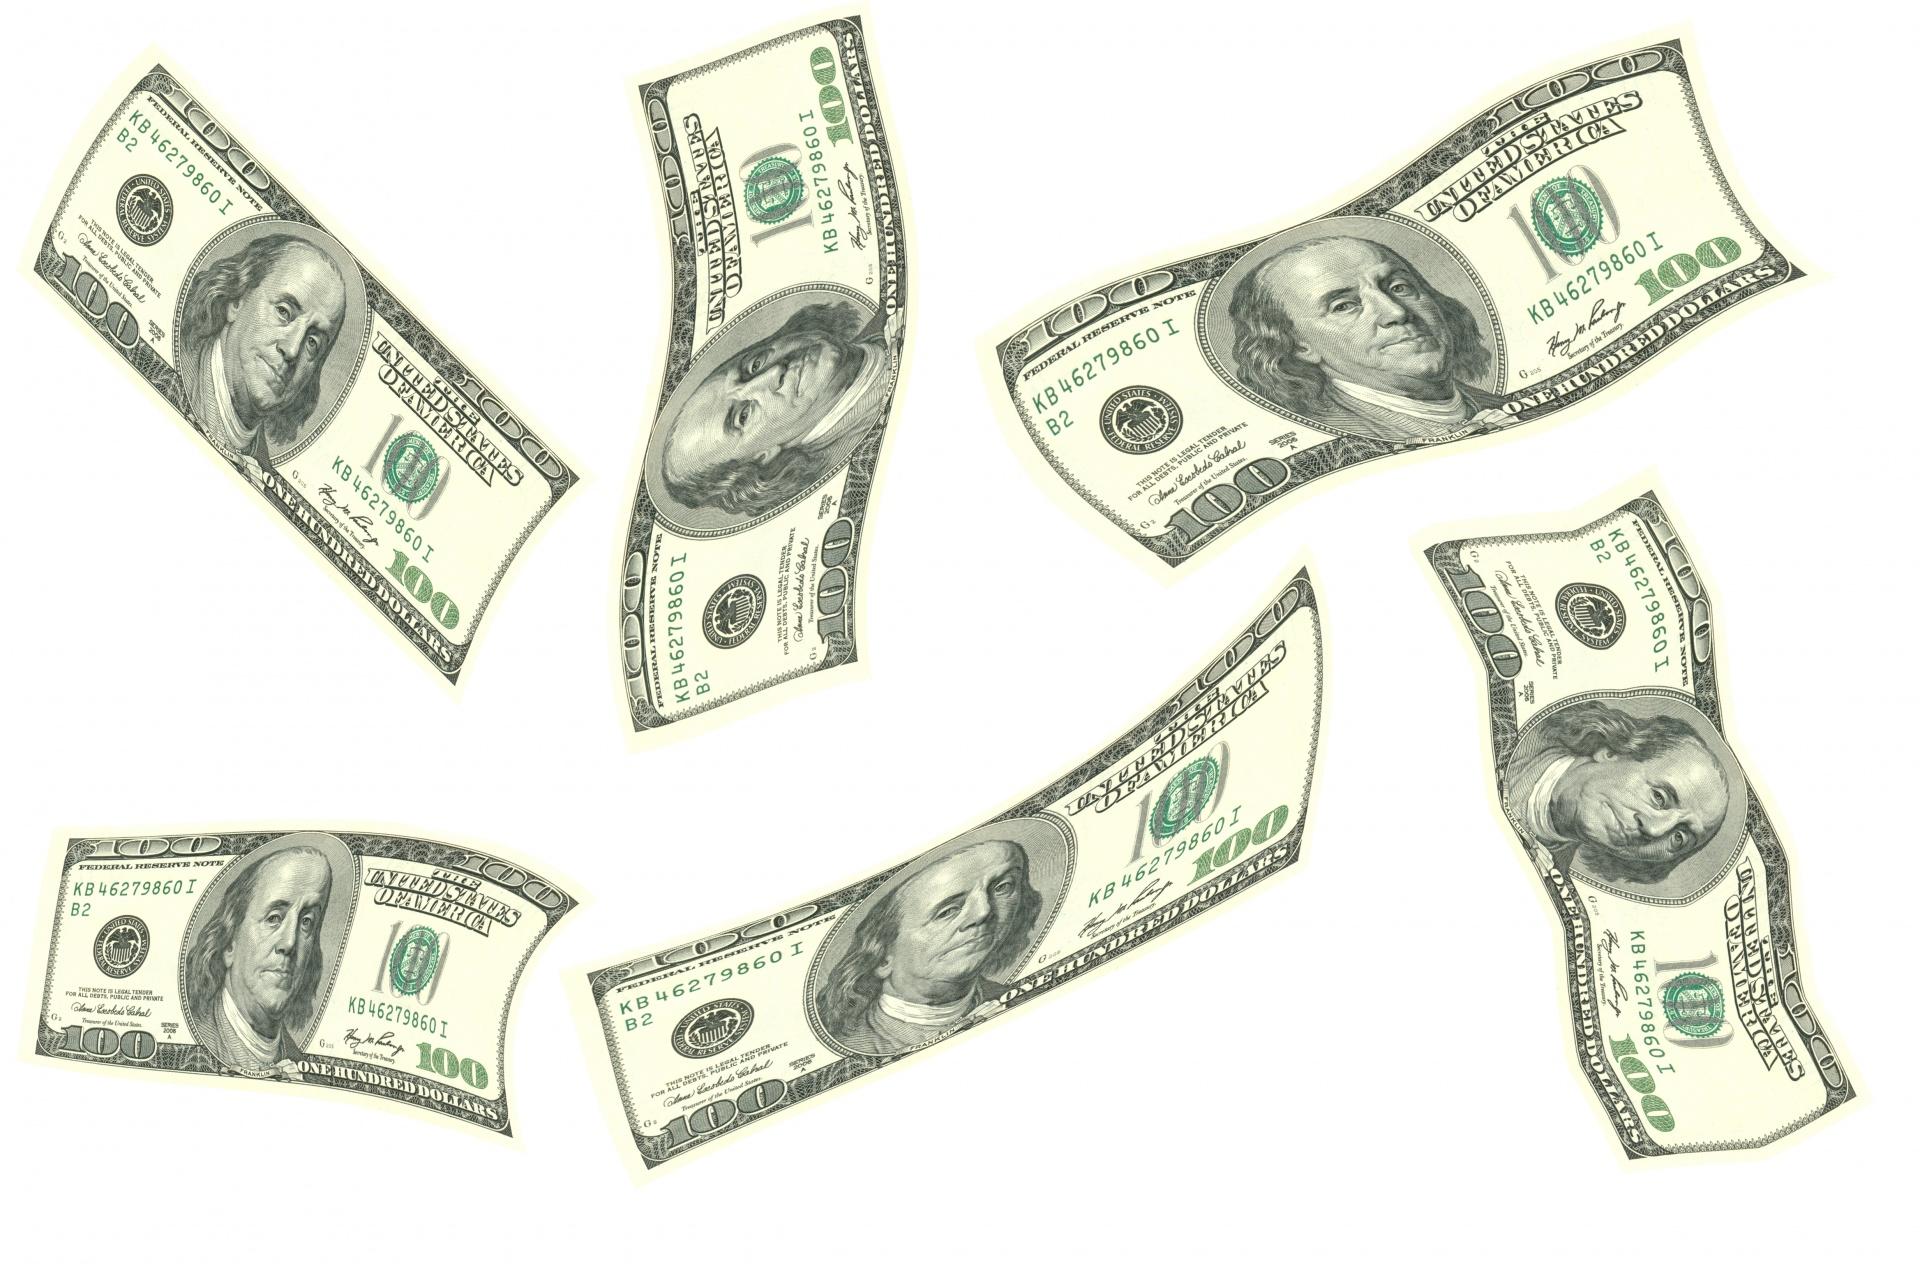 Rhode Island Money Transmitter License